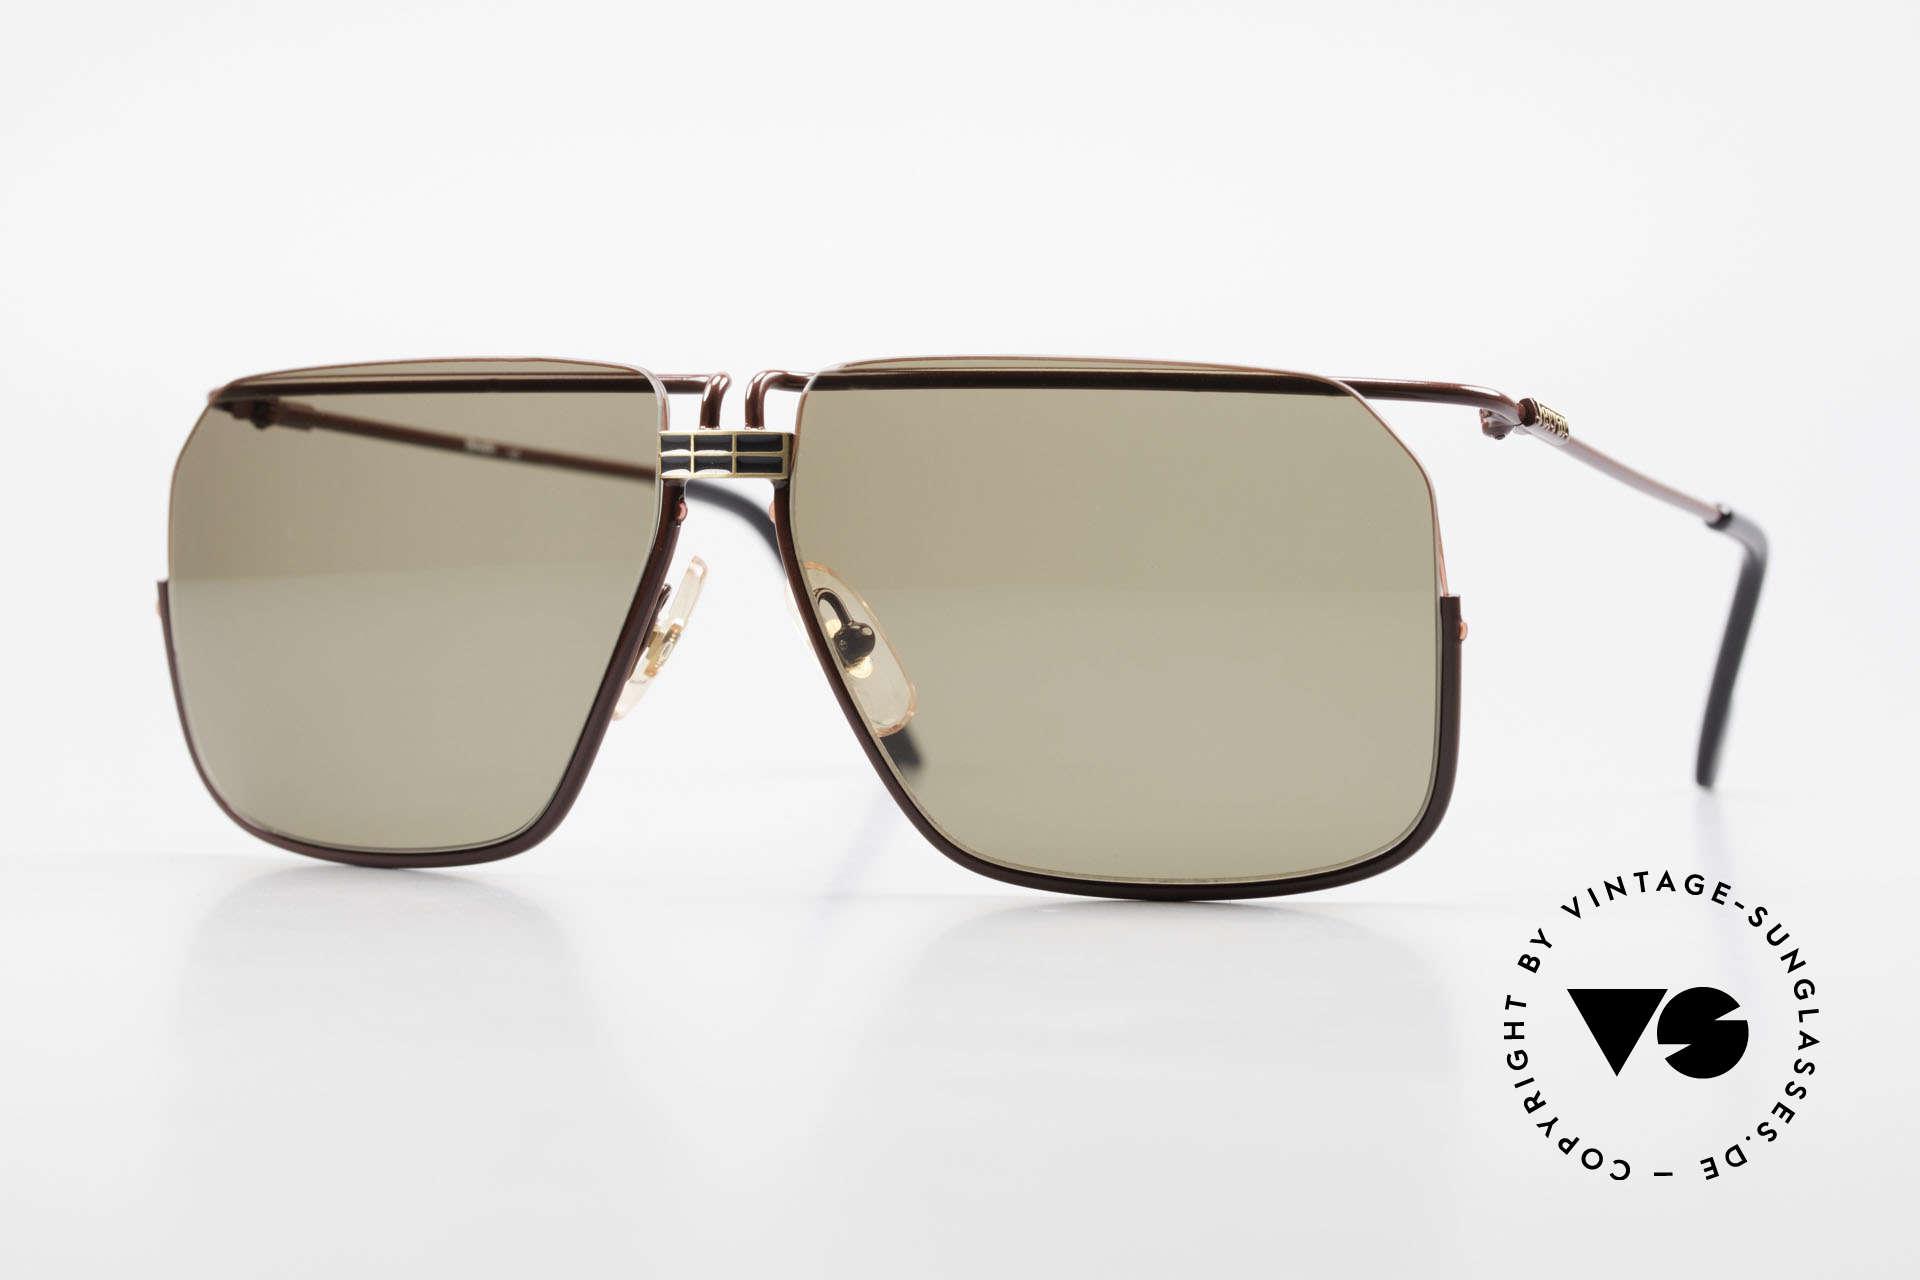 Ferrari F18/S Ferrari Formula 1 Sunglasses, striking vintage sunglasses by FERRARI from the 1990's, Made for Men